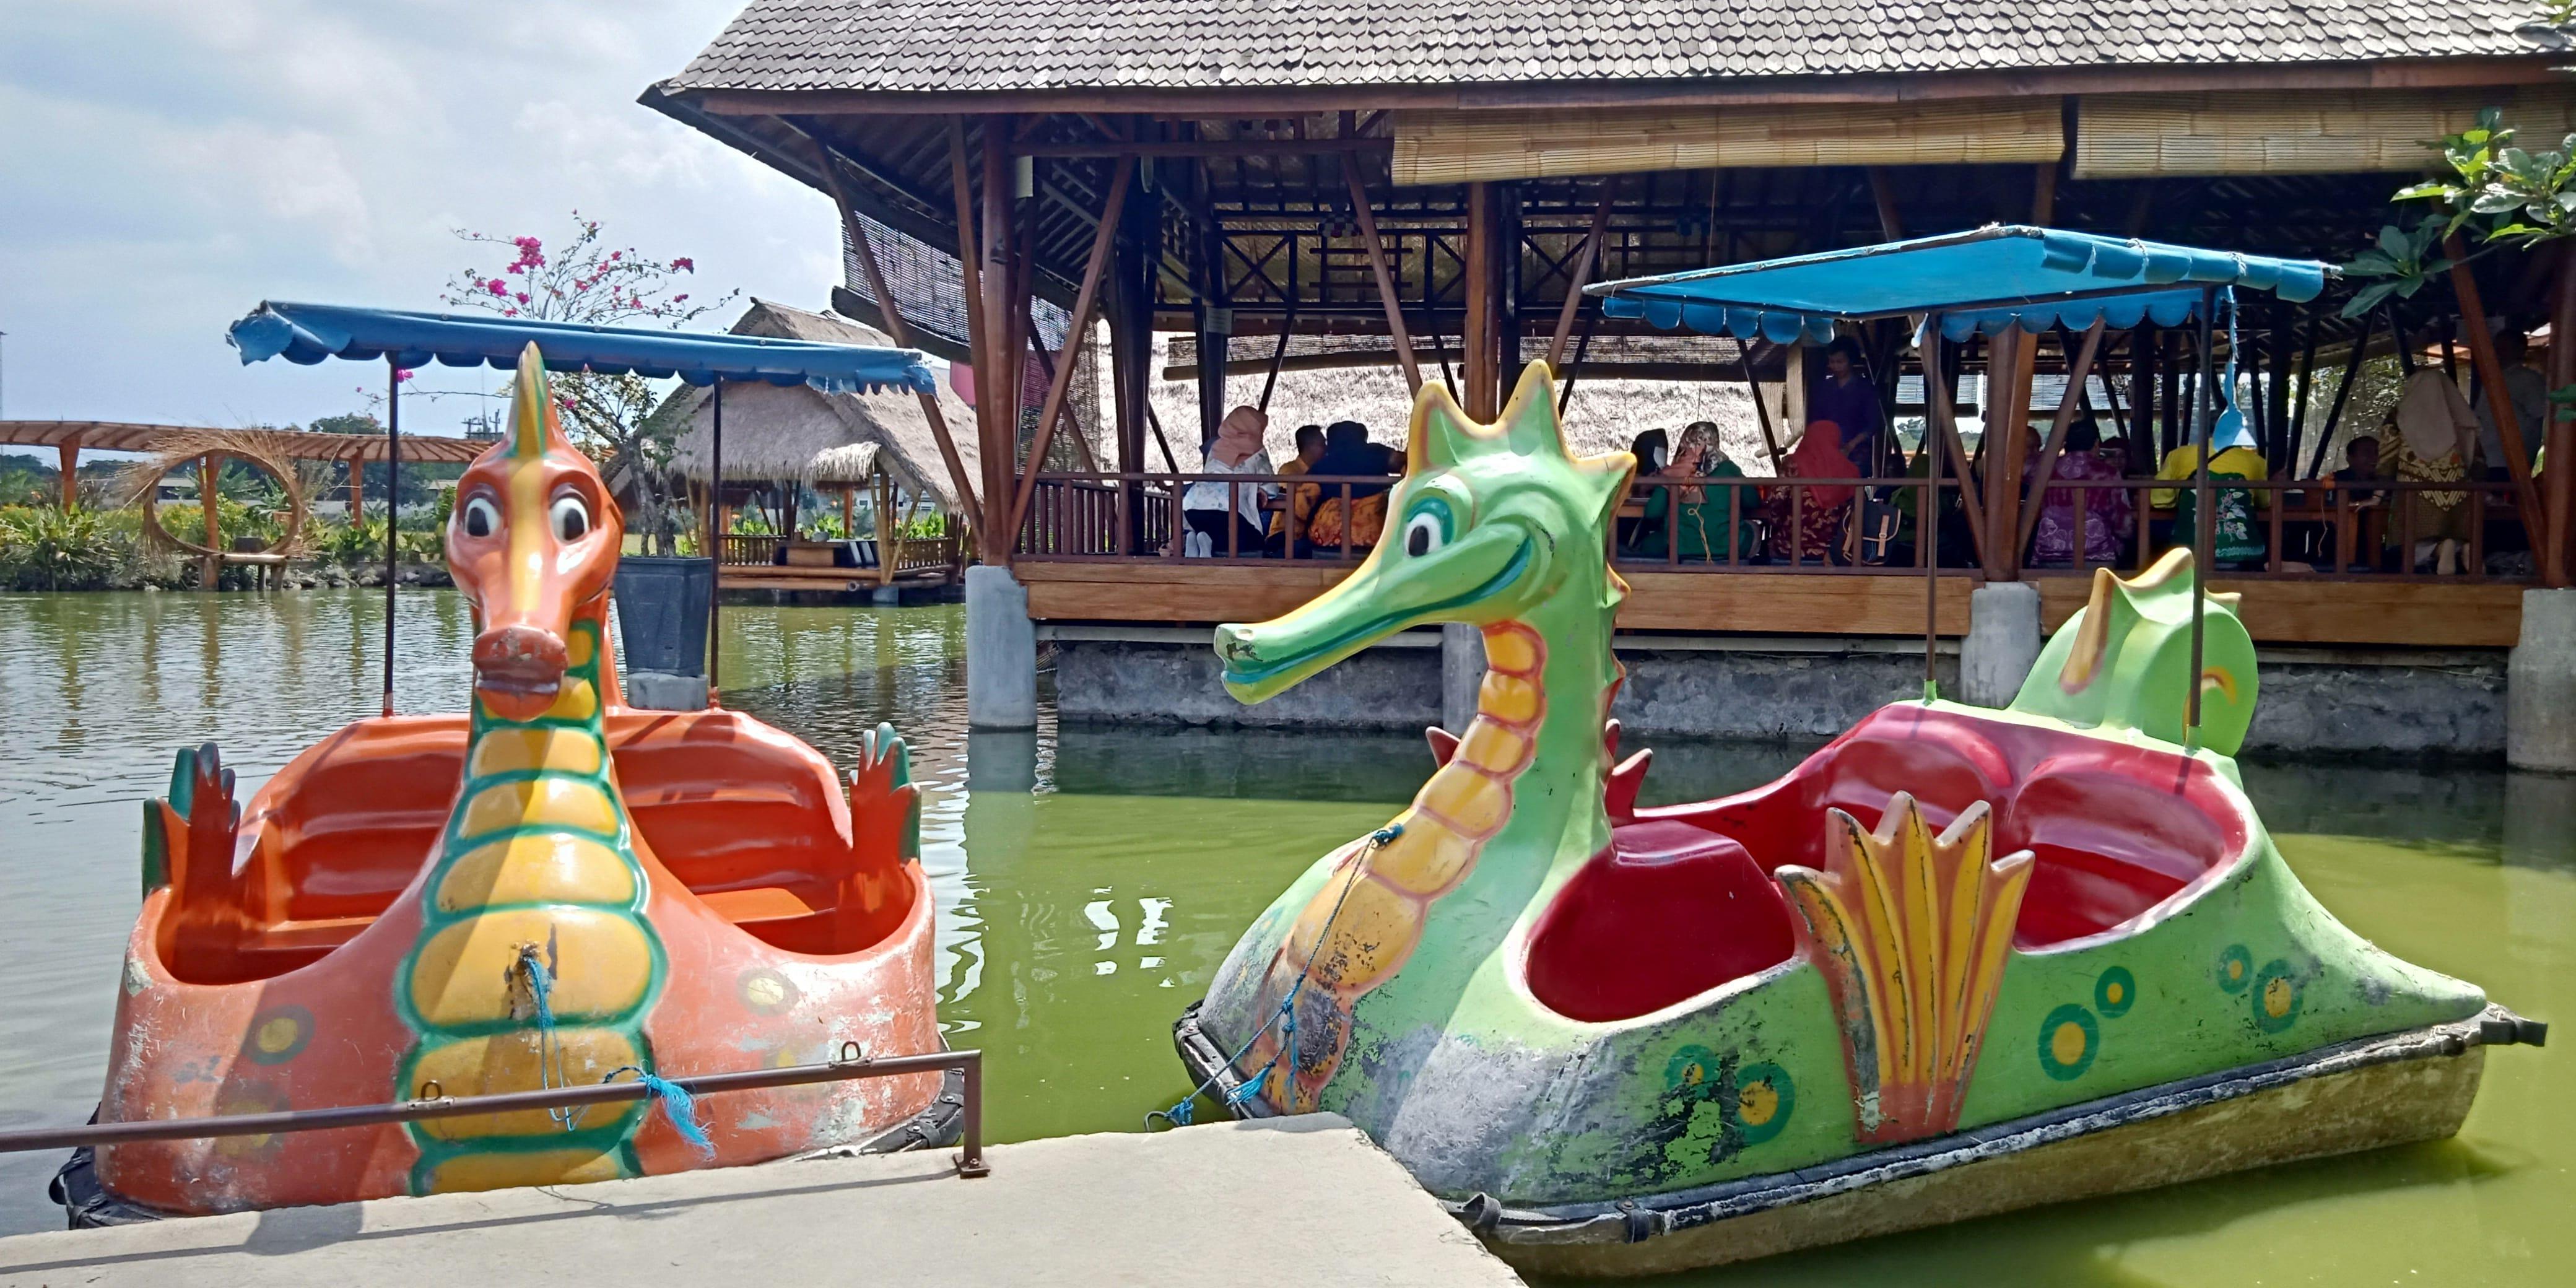 Sarana Bermain Perahu Bebek di Mang Engking Solo